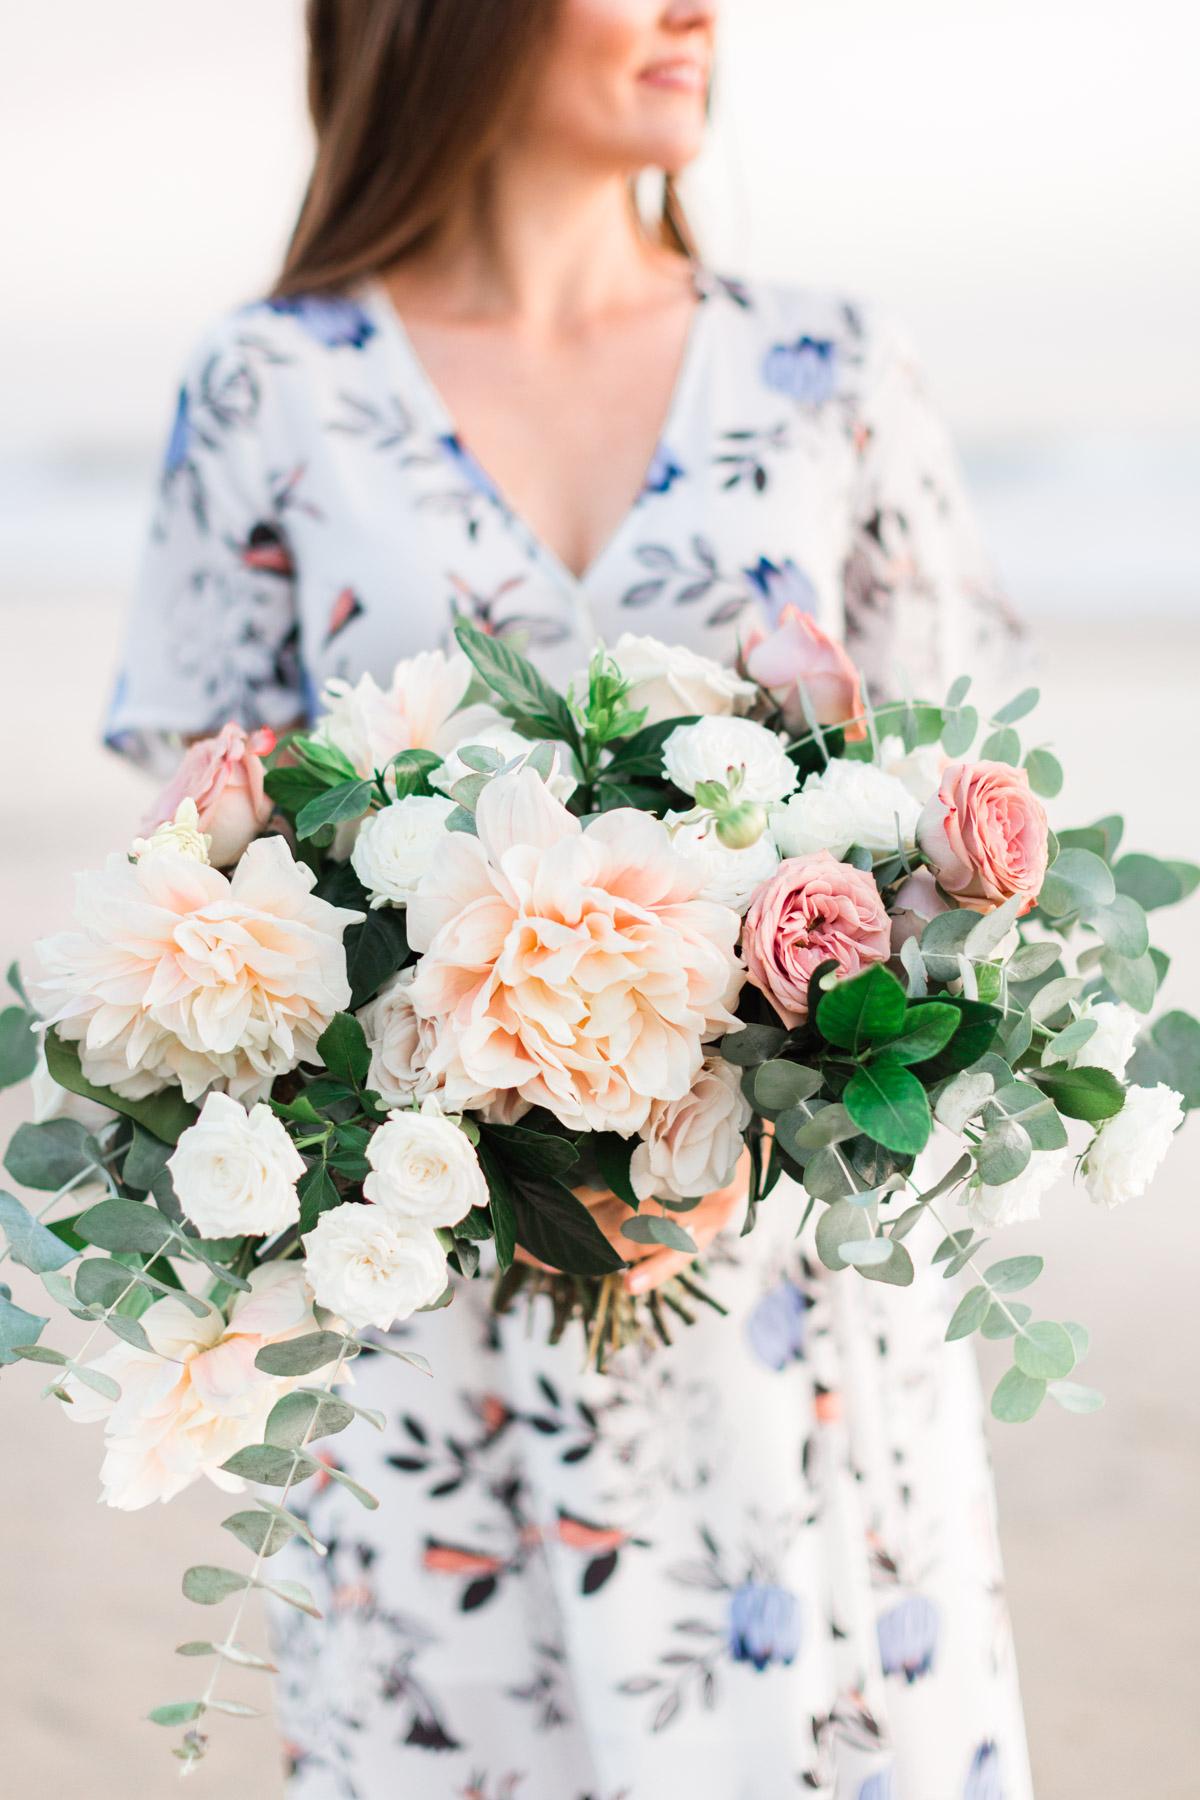 Blush dahlia, white rose and eucalyptus. Modern, romantic, elegant beach bridal bouquet | Newport Beach, CA | Compass Floral | Wedding Florist in San Diego and Southern California | Cavin Elizabeth Photography